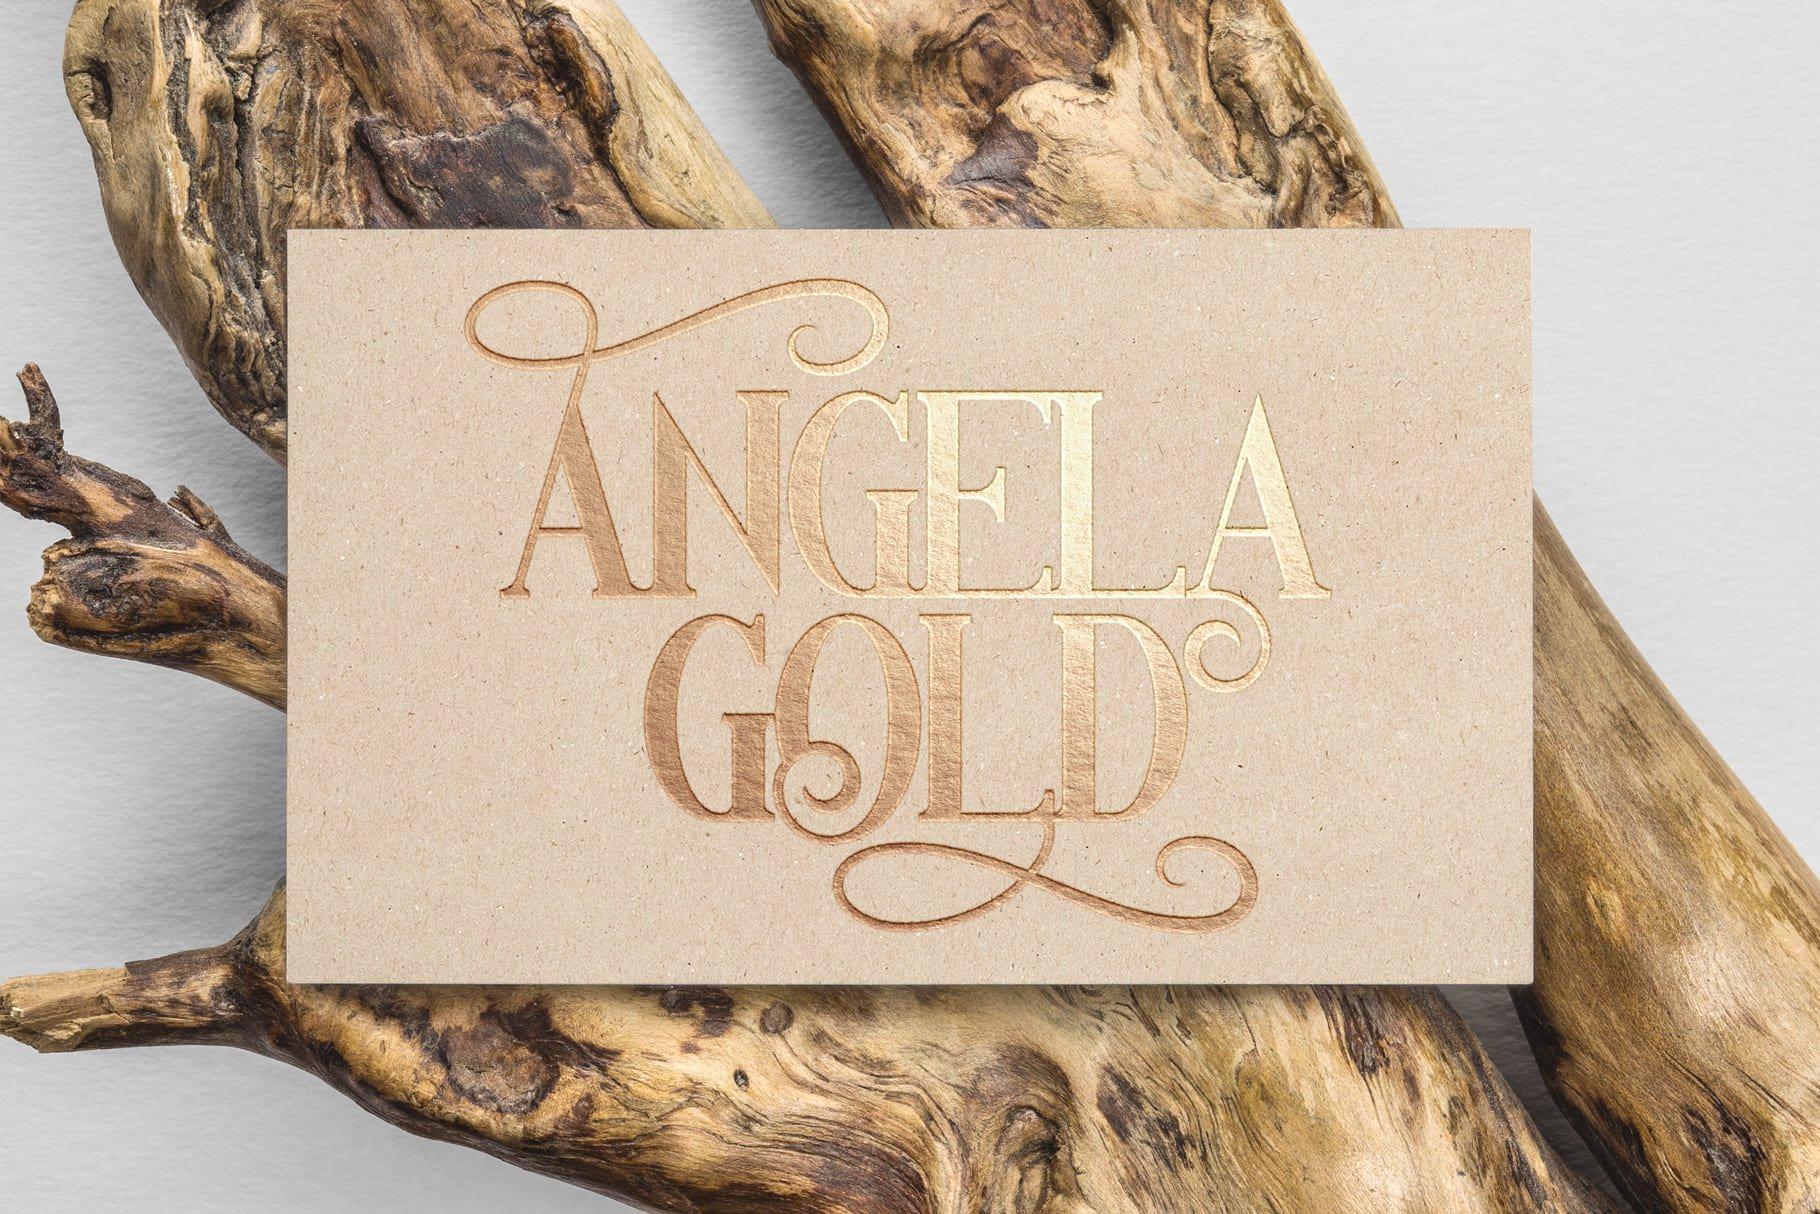 Luxurious golden lettering on plain beige paper.